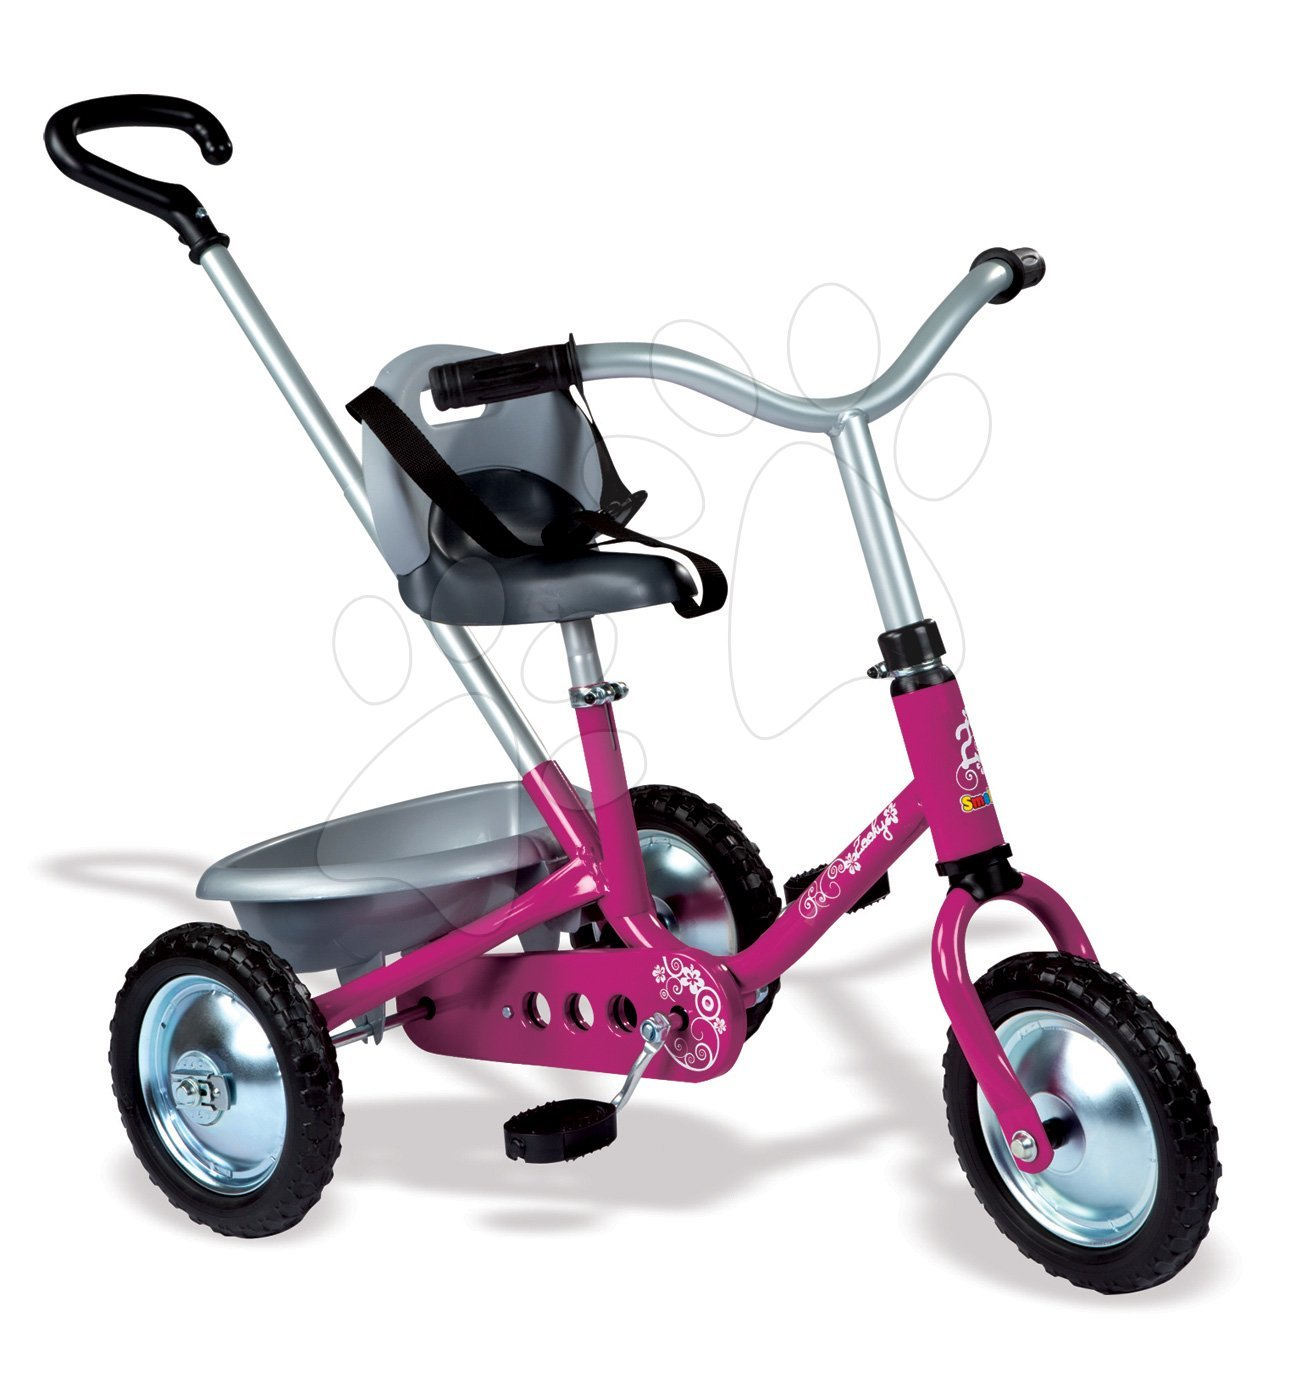 Tricikel z verižnim pogonom Zooky Classic Girl Smoby rožnat od 16 mes